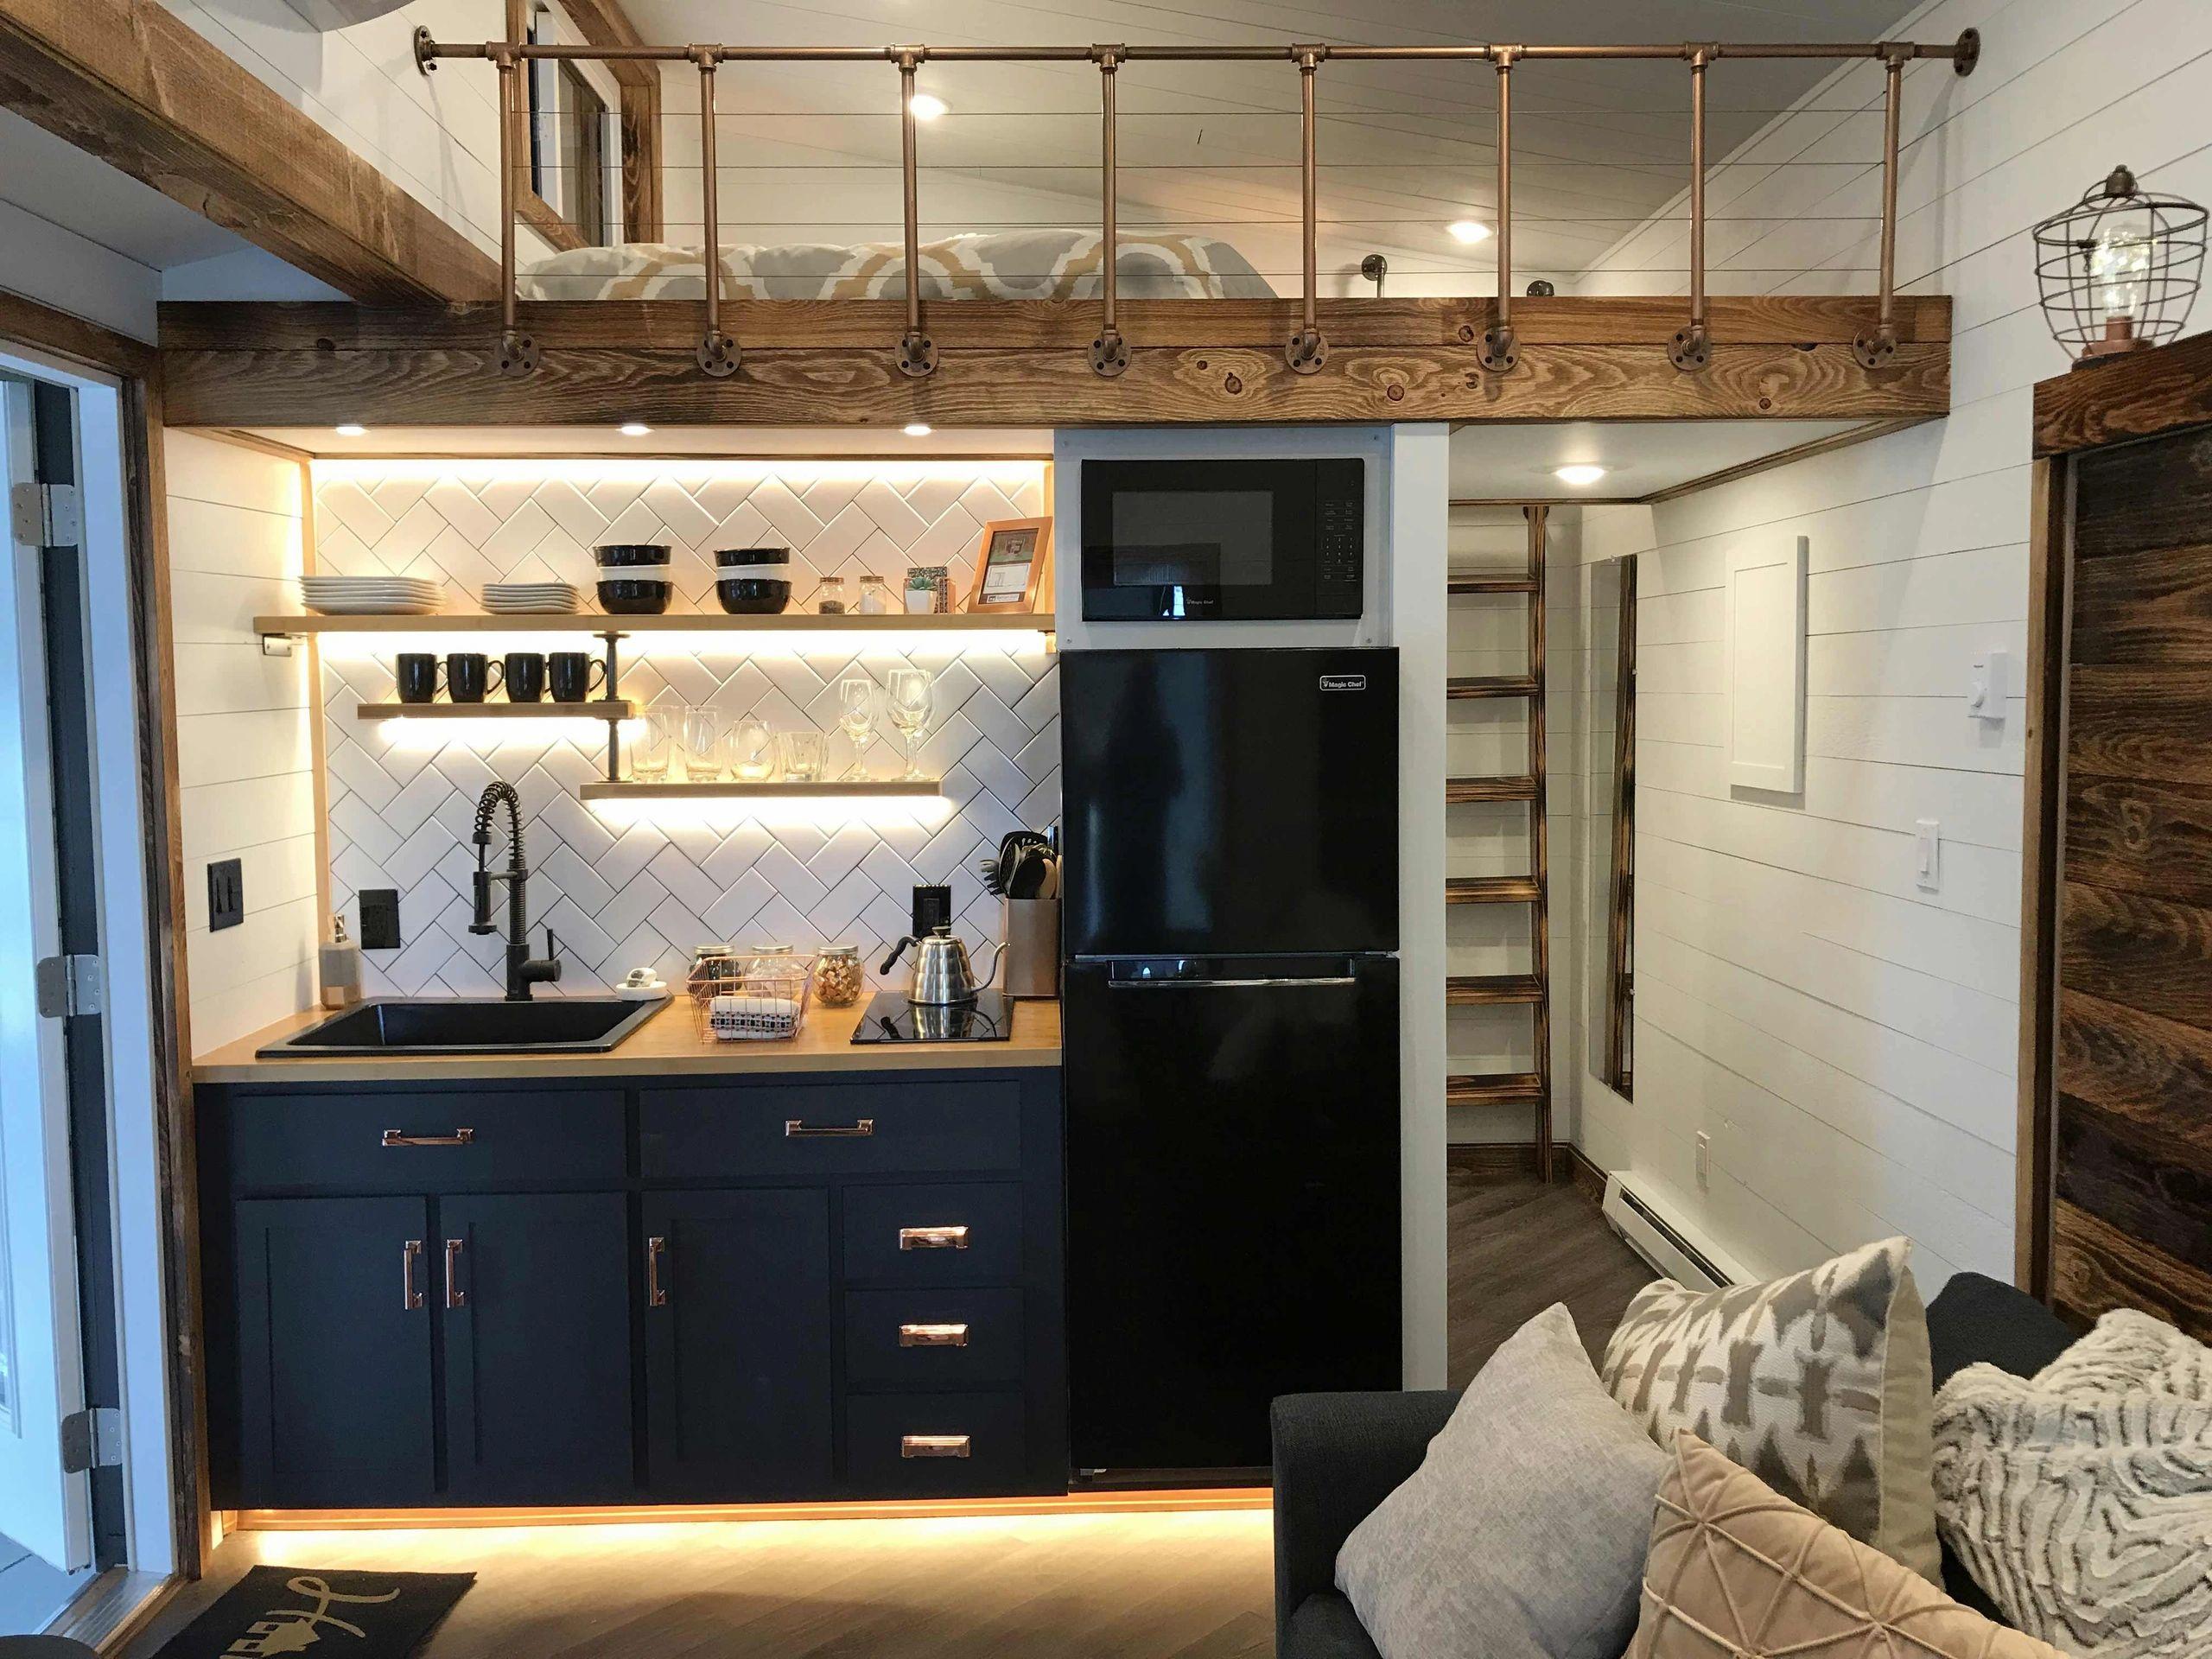 Tiny Houses for Sale - Bantam Built